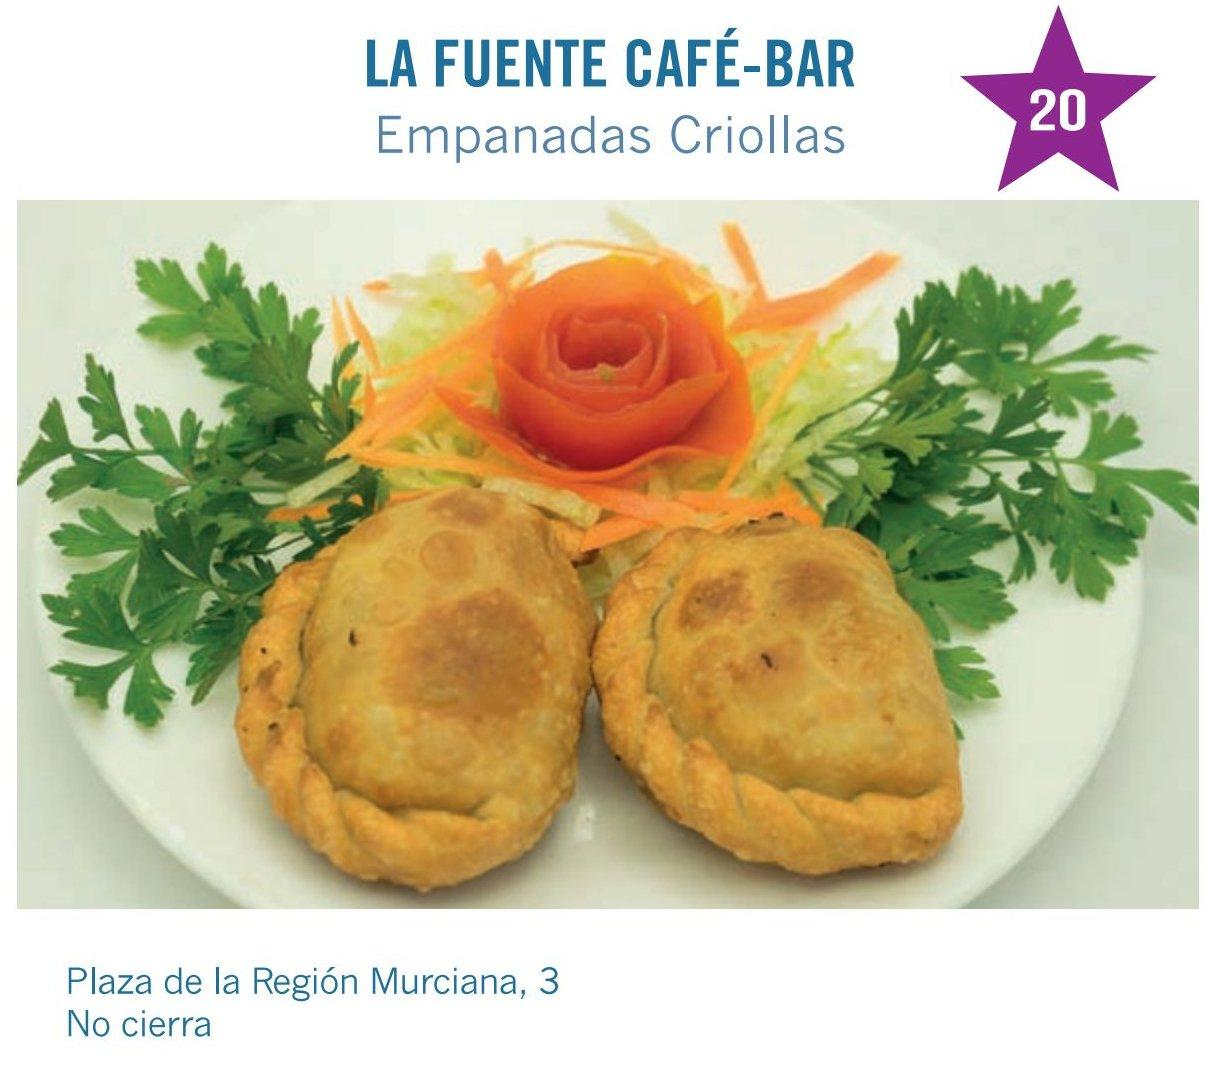 Tapa de La Fuente Café-Bar para molina tapas 2017